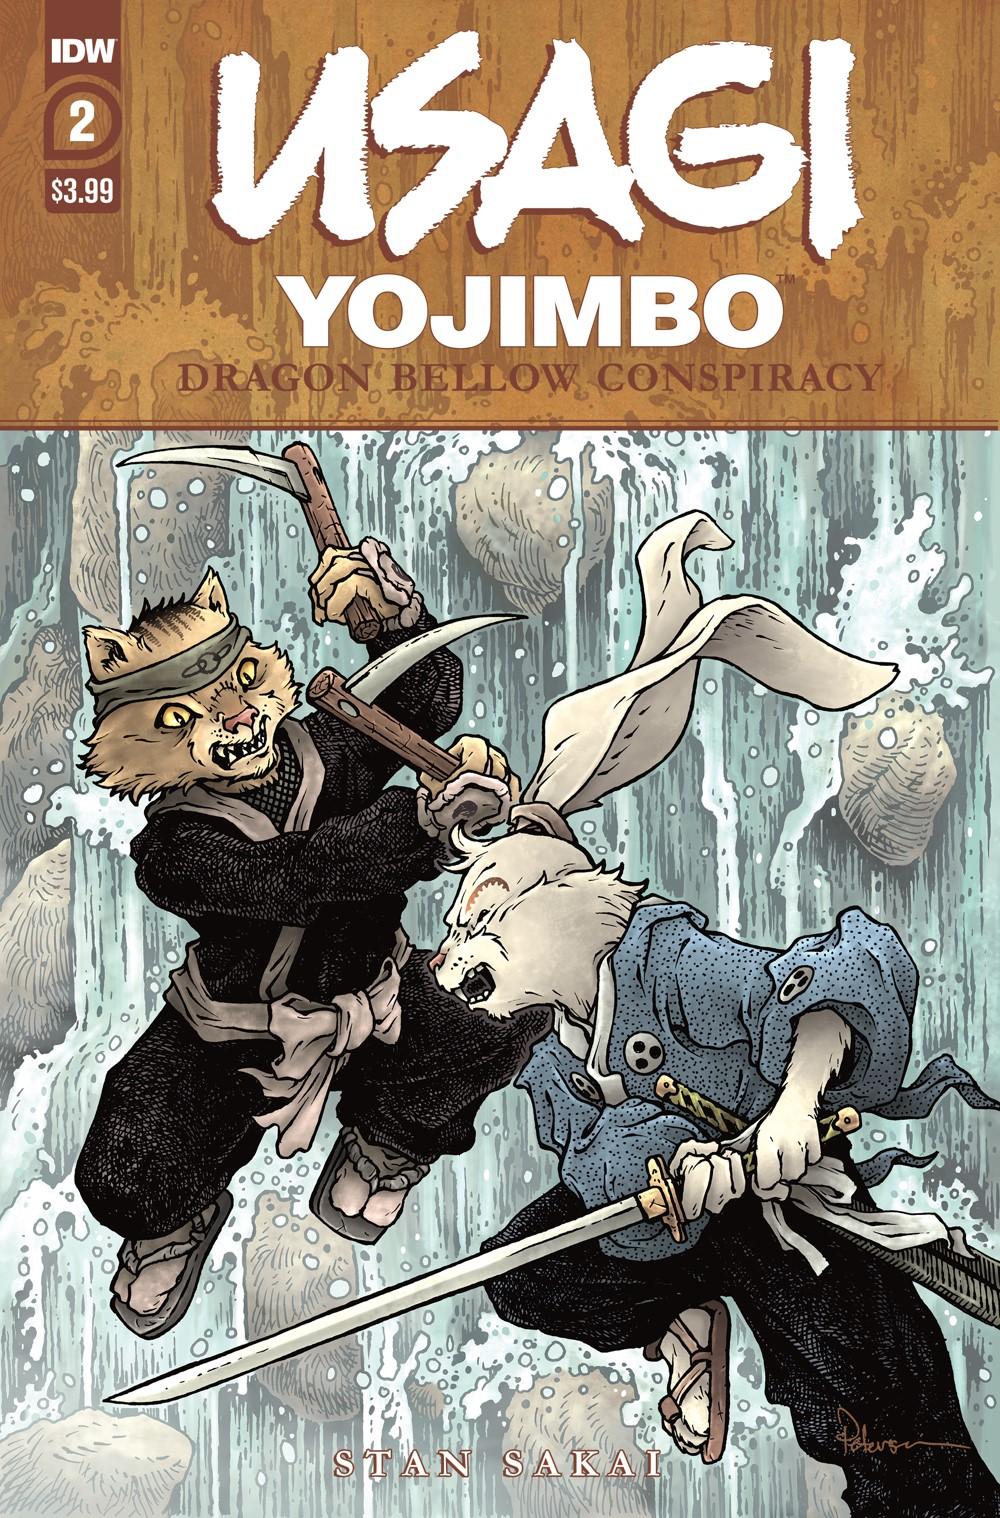 Usagi-DBC02_cvrA ComicList Previews: USAGI YOJIMBO THE DRAGON BELLOW CONSPIRACY #2 (OF 6)